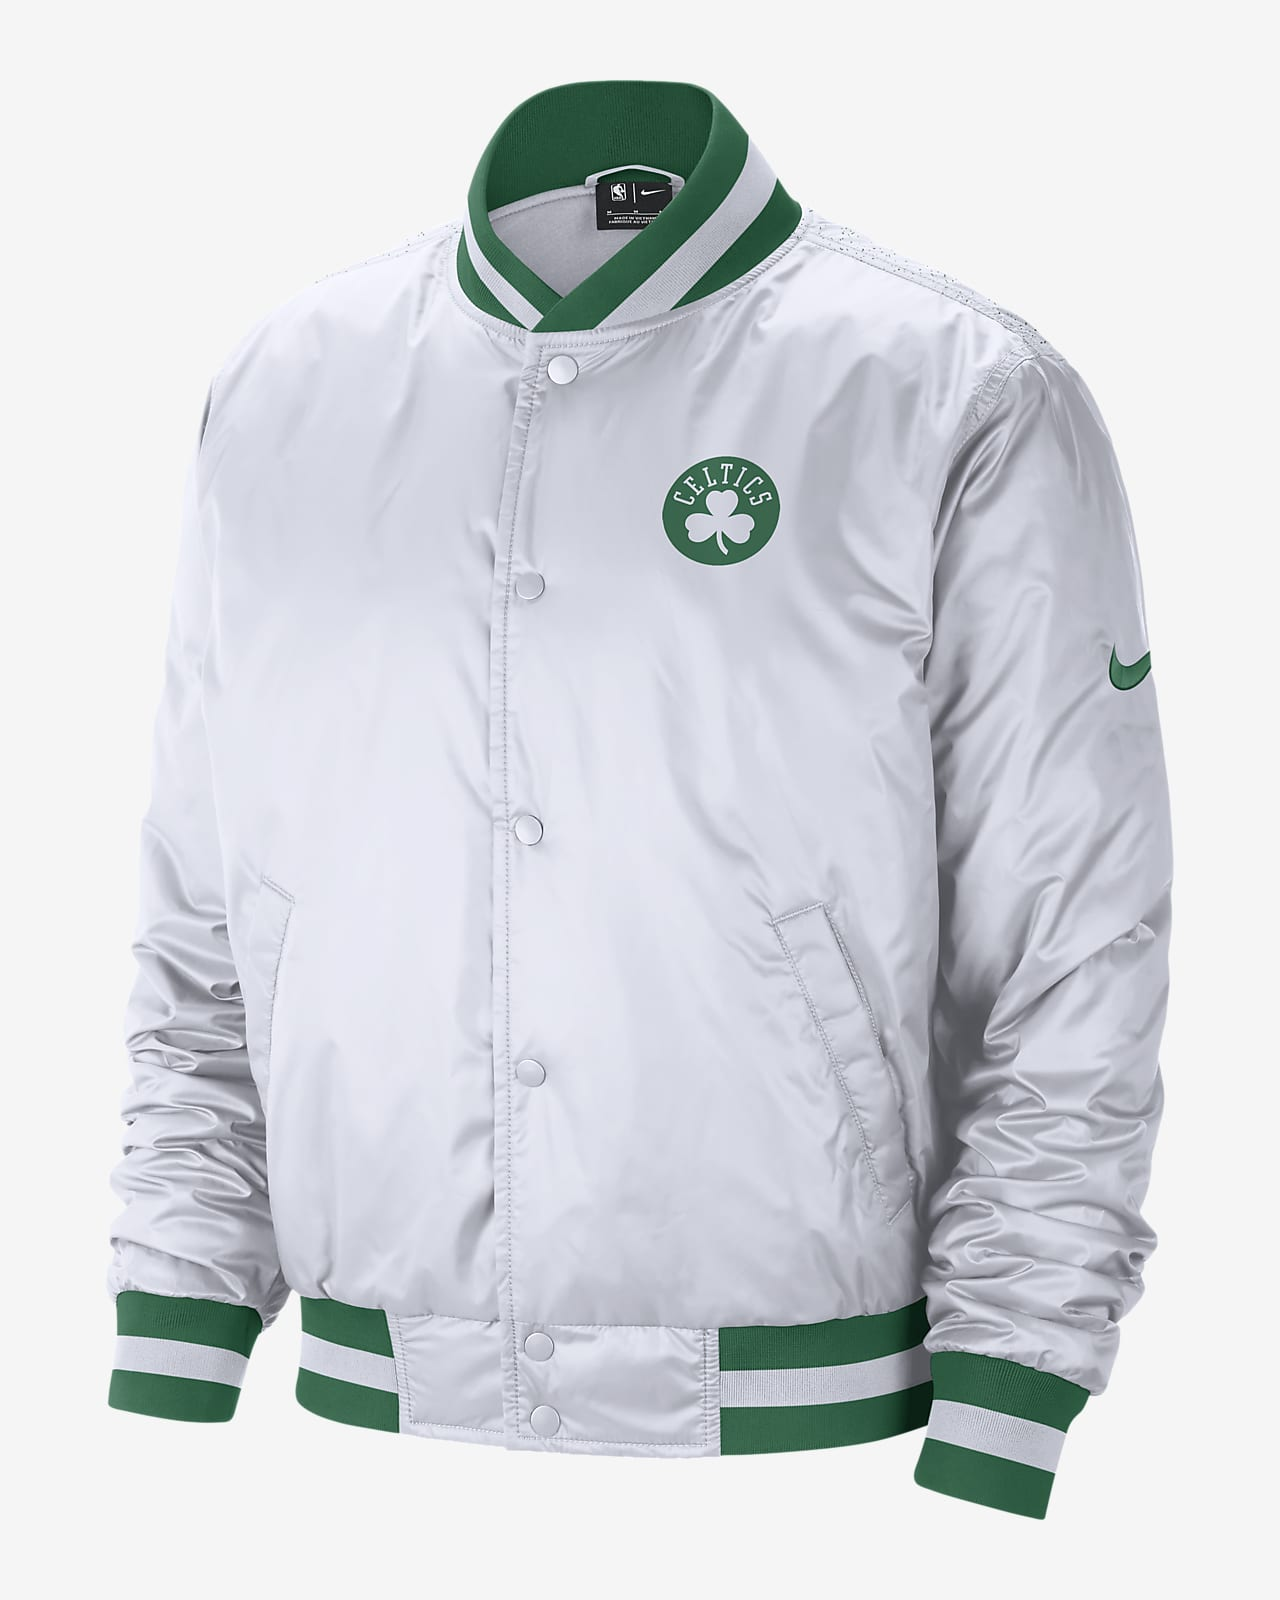 Chamarra Nike NBA para hombre Boston Celtics City Edition Courtside